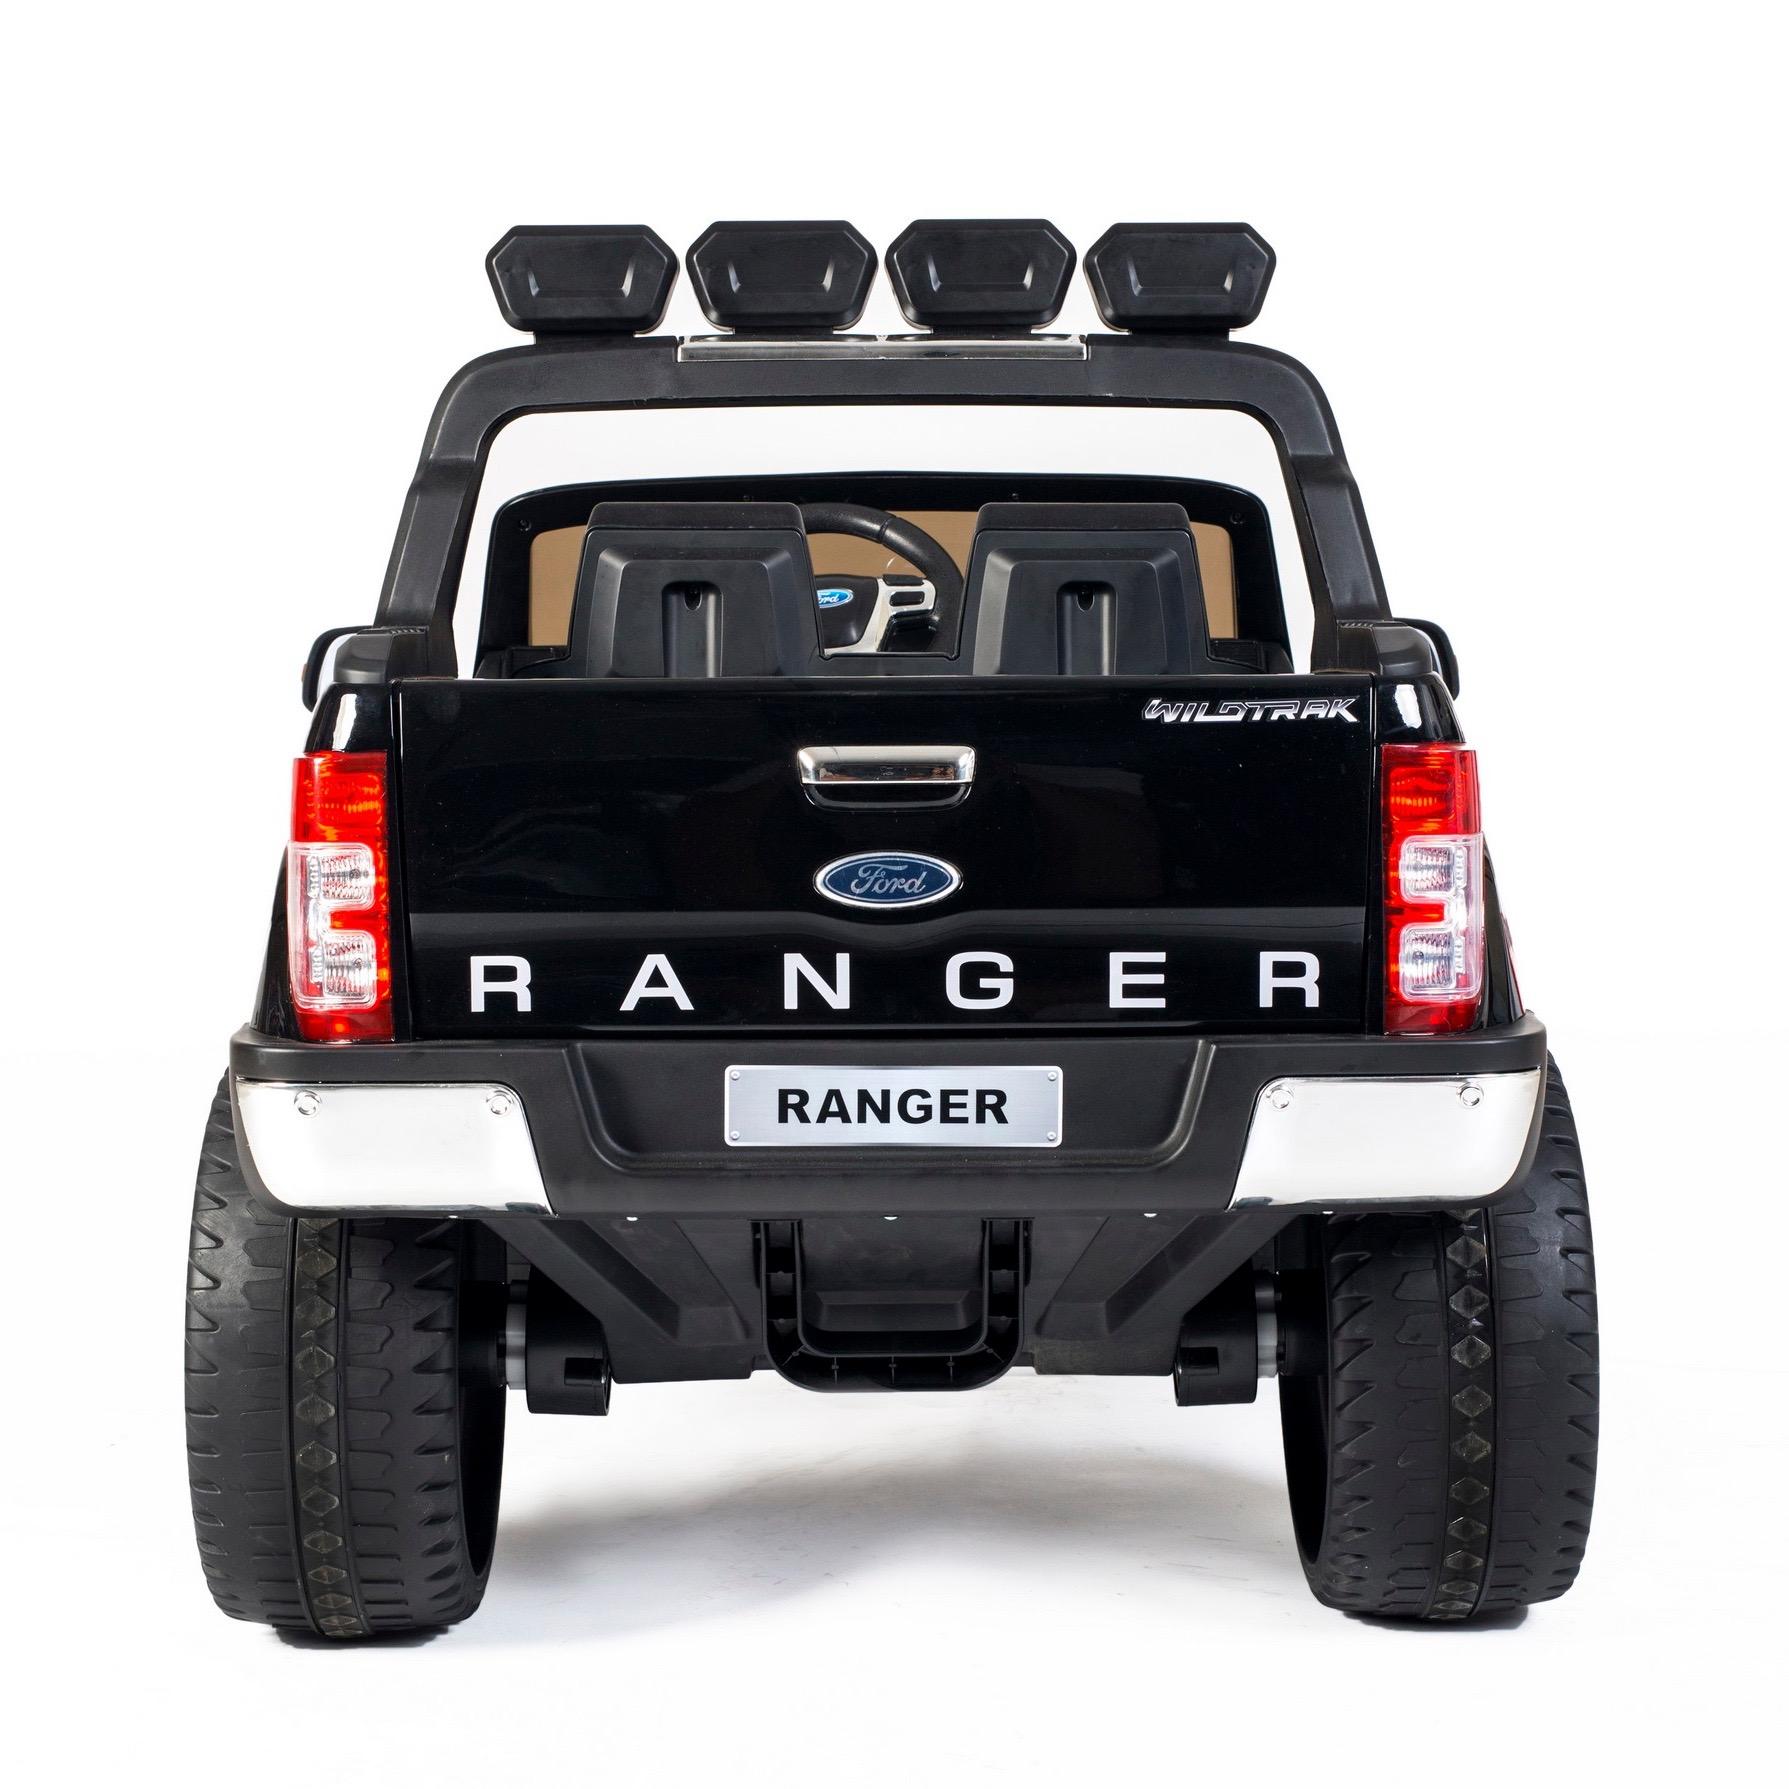 Ford Ranger Wildtrak 2017 licensed 4WD 24V Battery Ride On ...